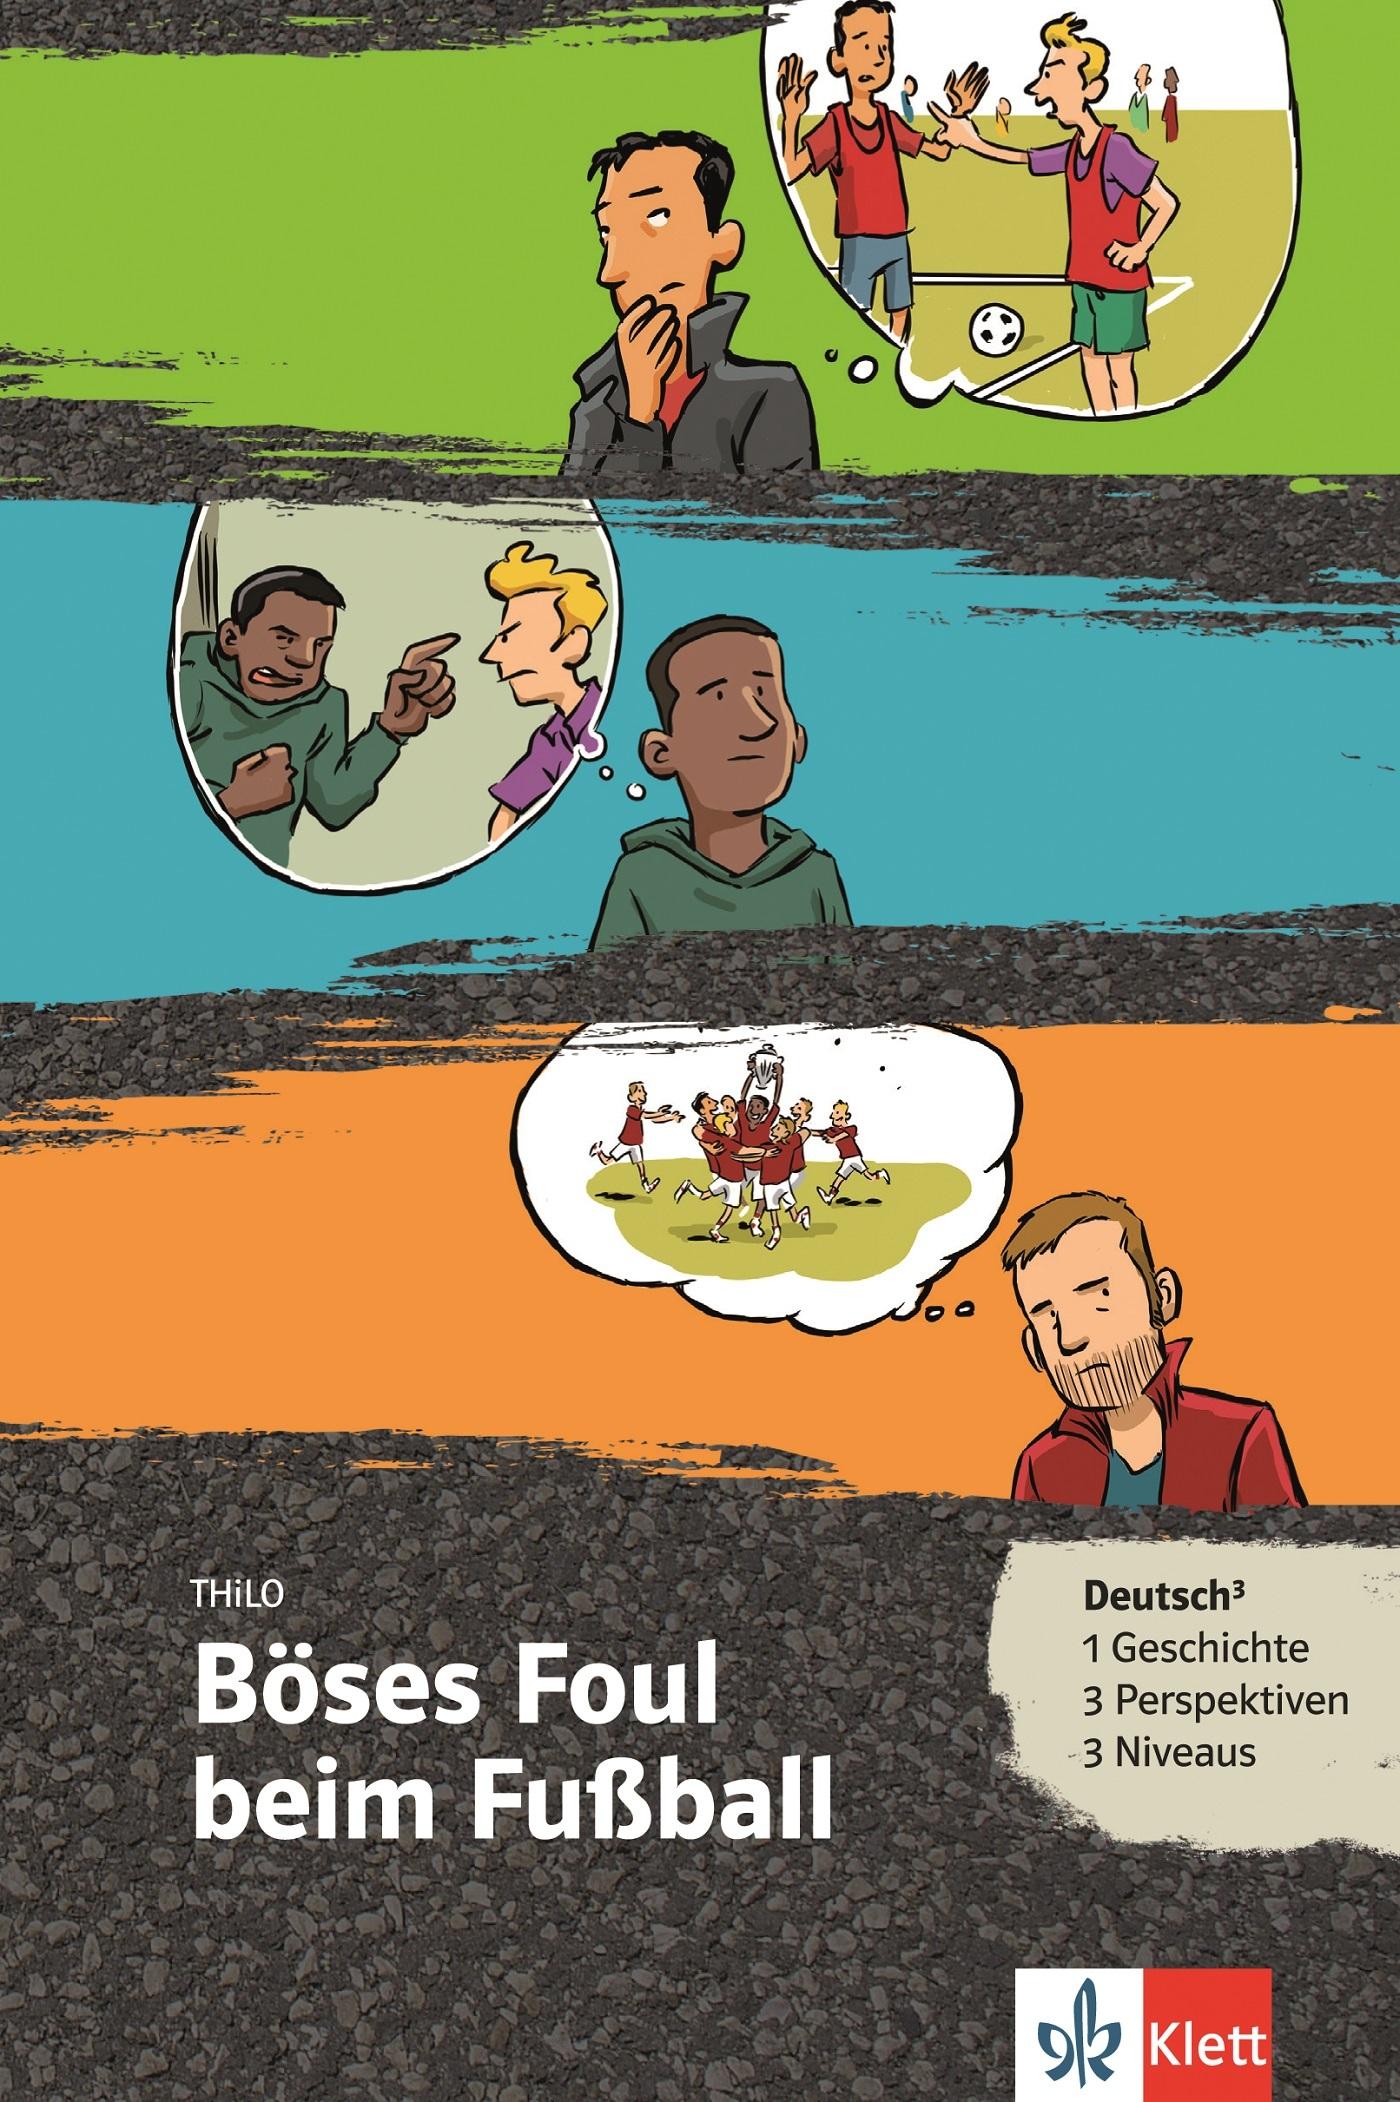 BOSES FOUL BEIM FUSSBALL (NIVEAU A1-B1) - LIVRE + MP3 TELECHARGEABLE